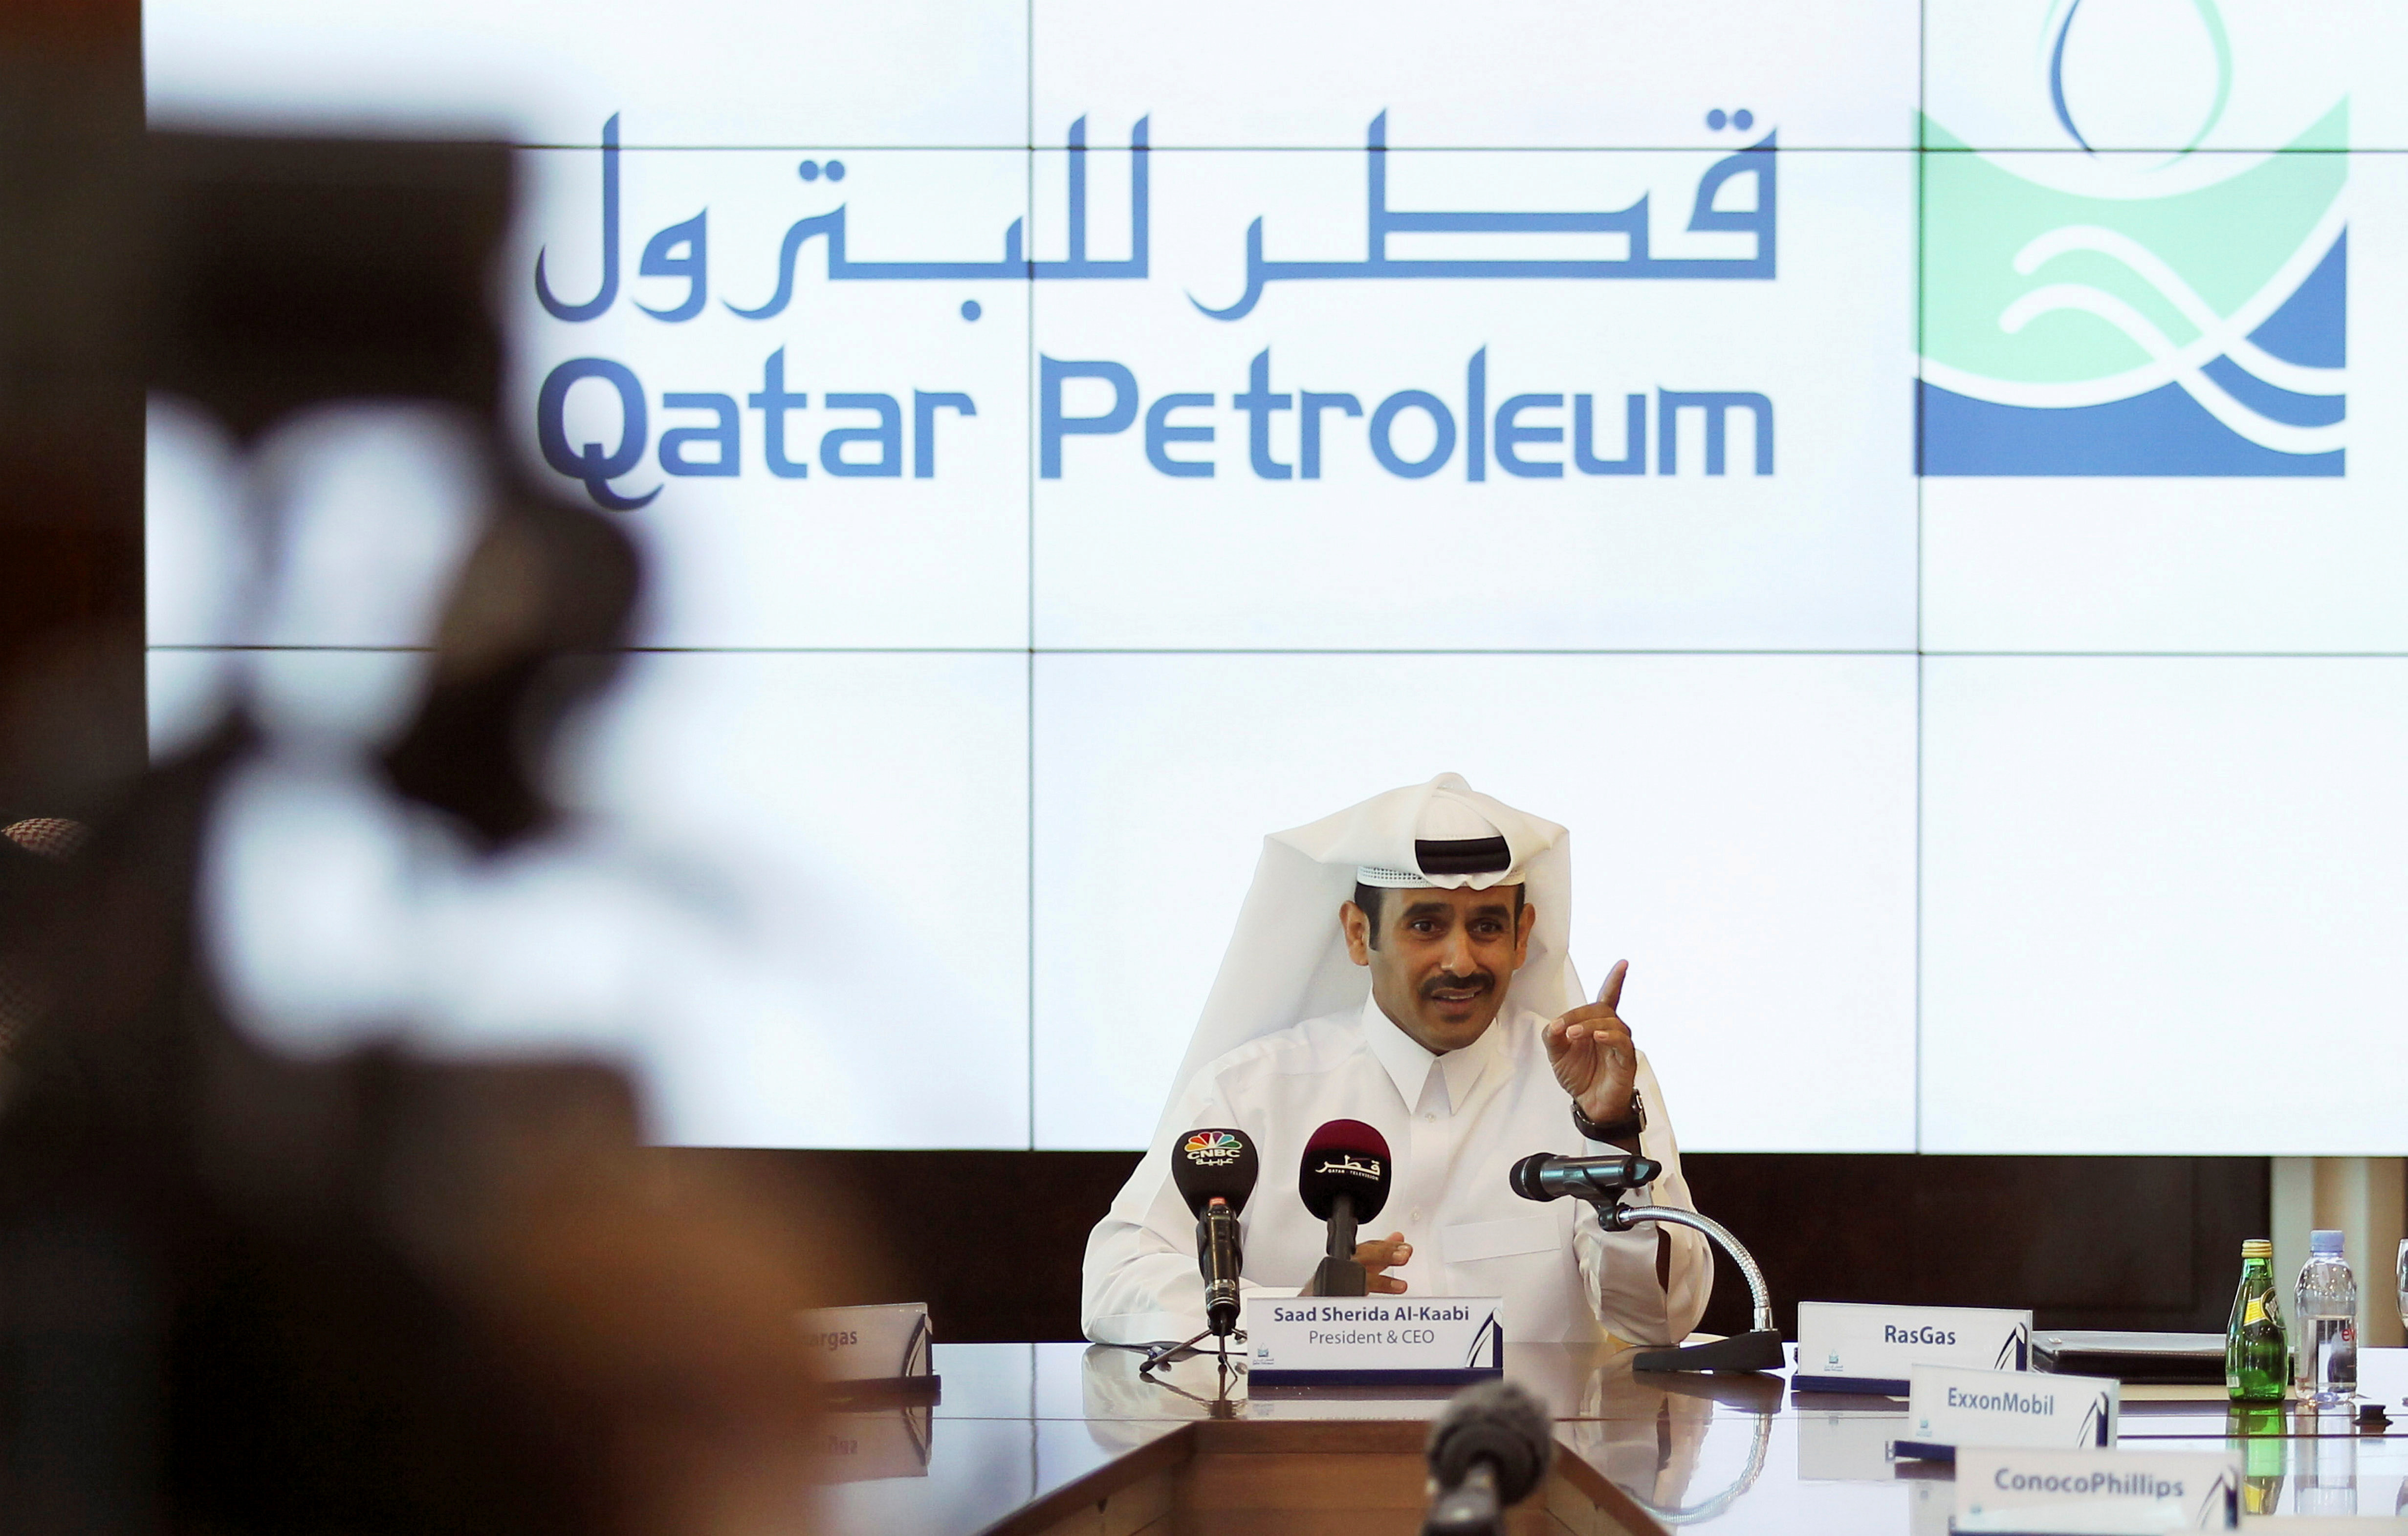 Saad al-Kaabi, chief executive of Qatar Petroleum, gestures during a news conference in Doha, Qatar, December 11, 2016. REUTERS/Naseem Zeitoon/File Photo